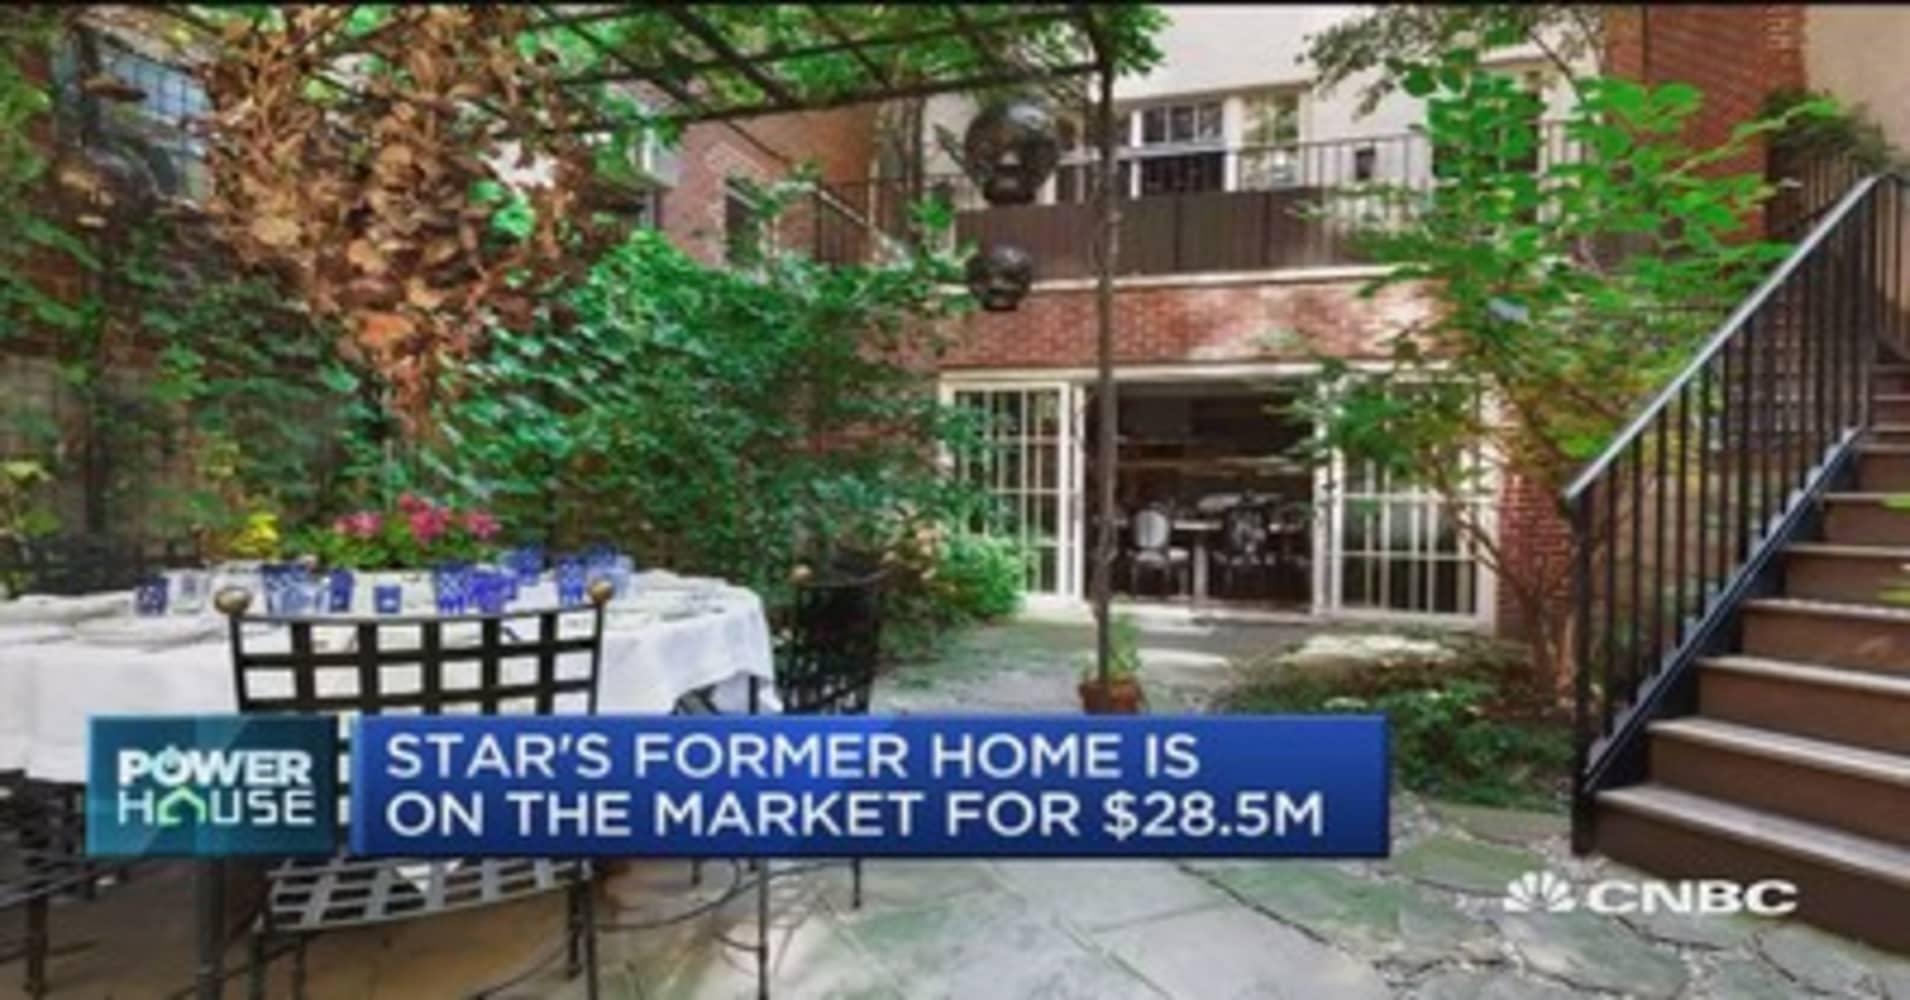 Meryl Streep House meryl streep's former nyc home on market for $28.5m